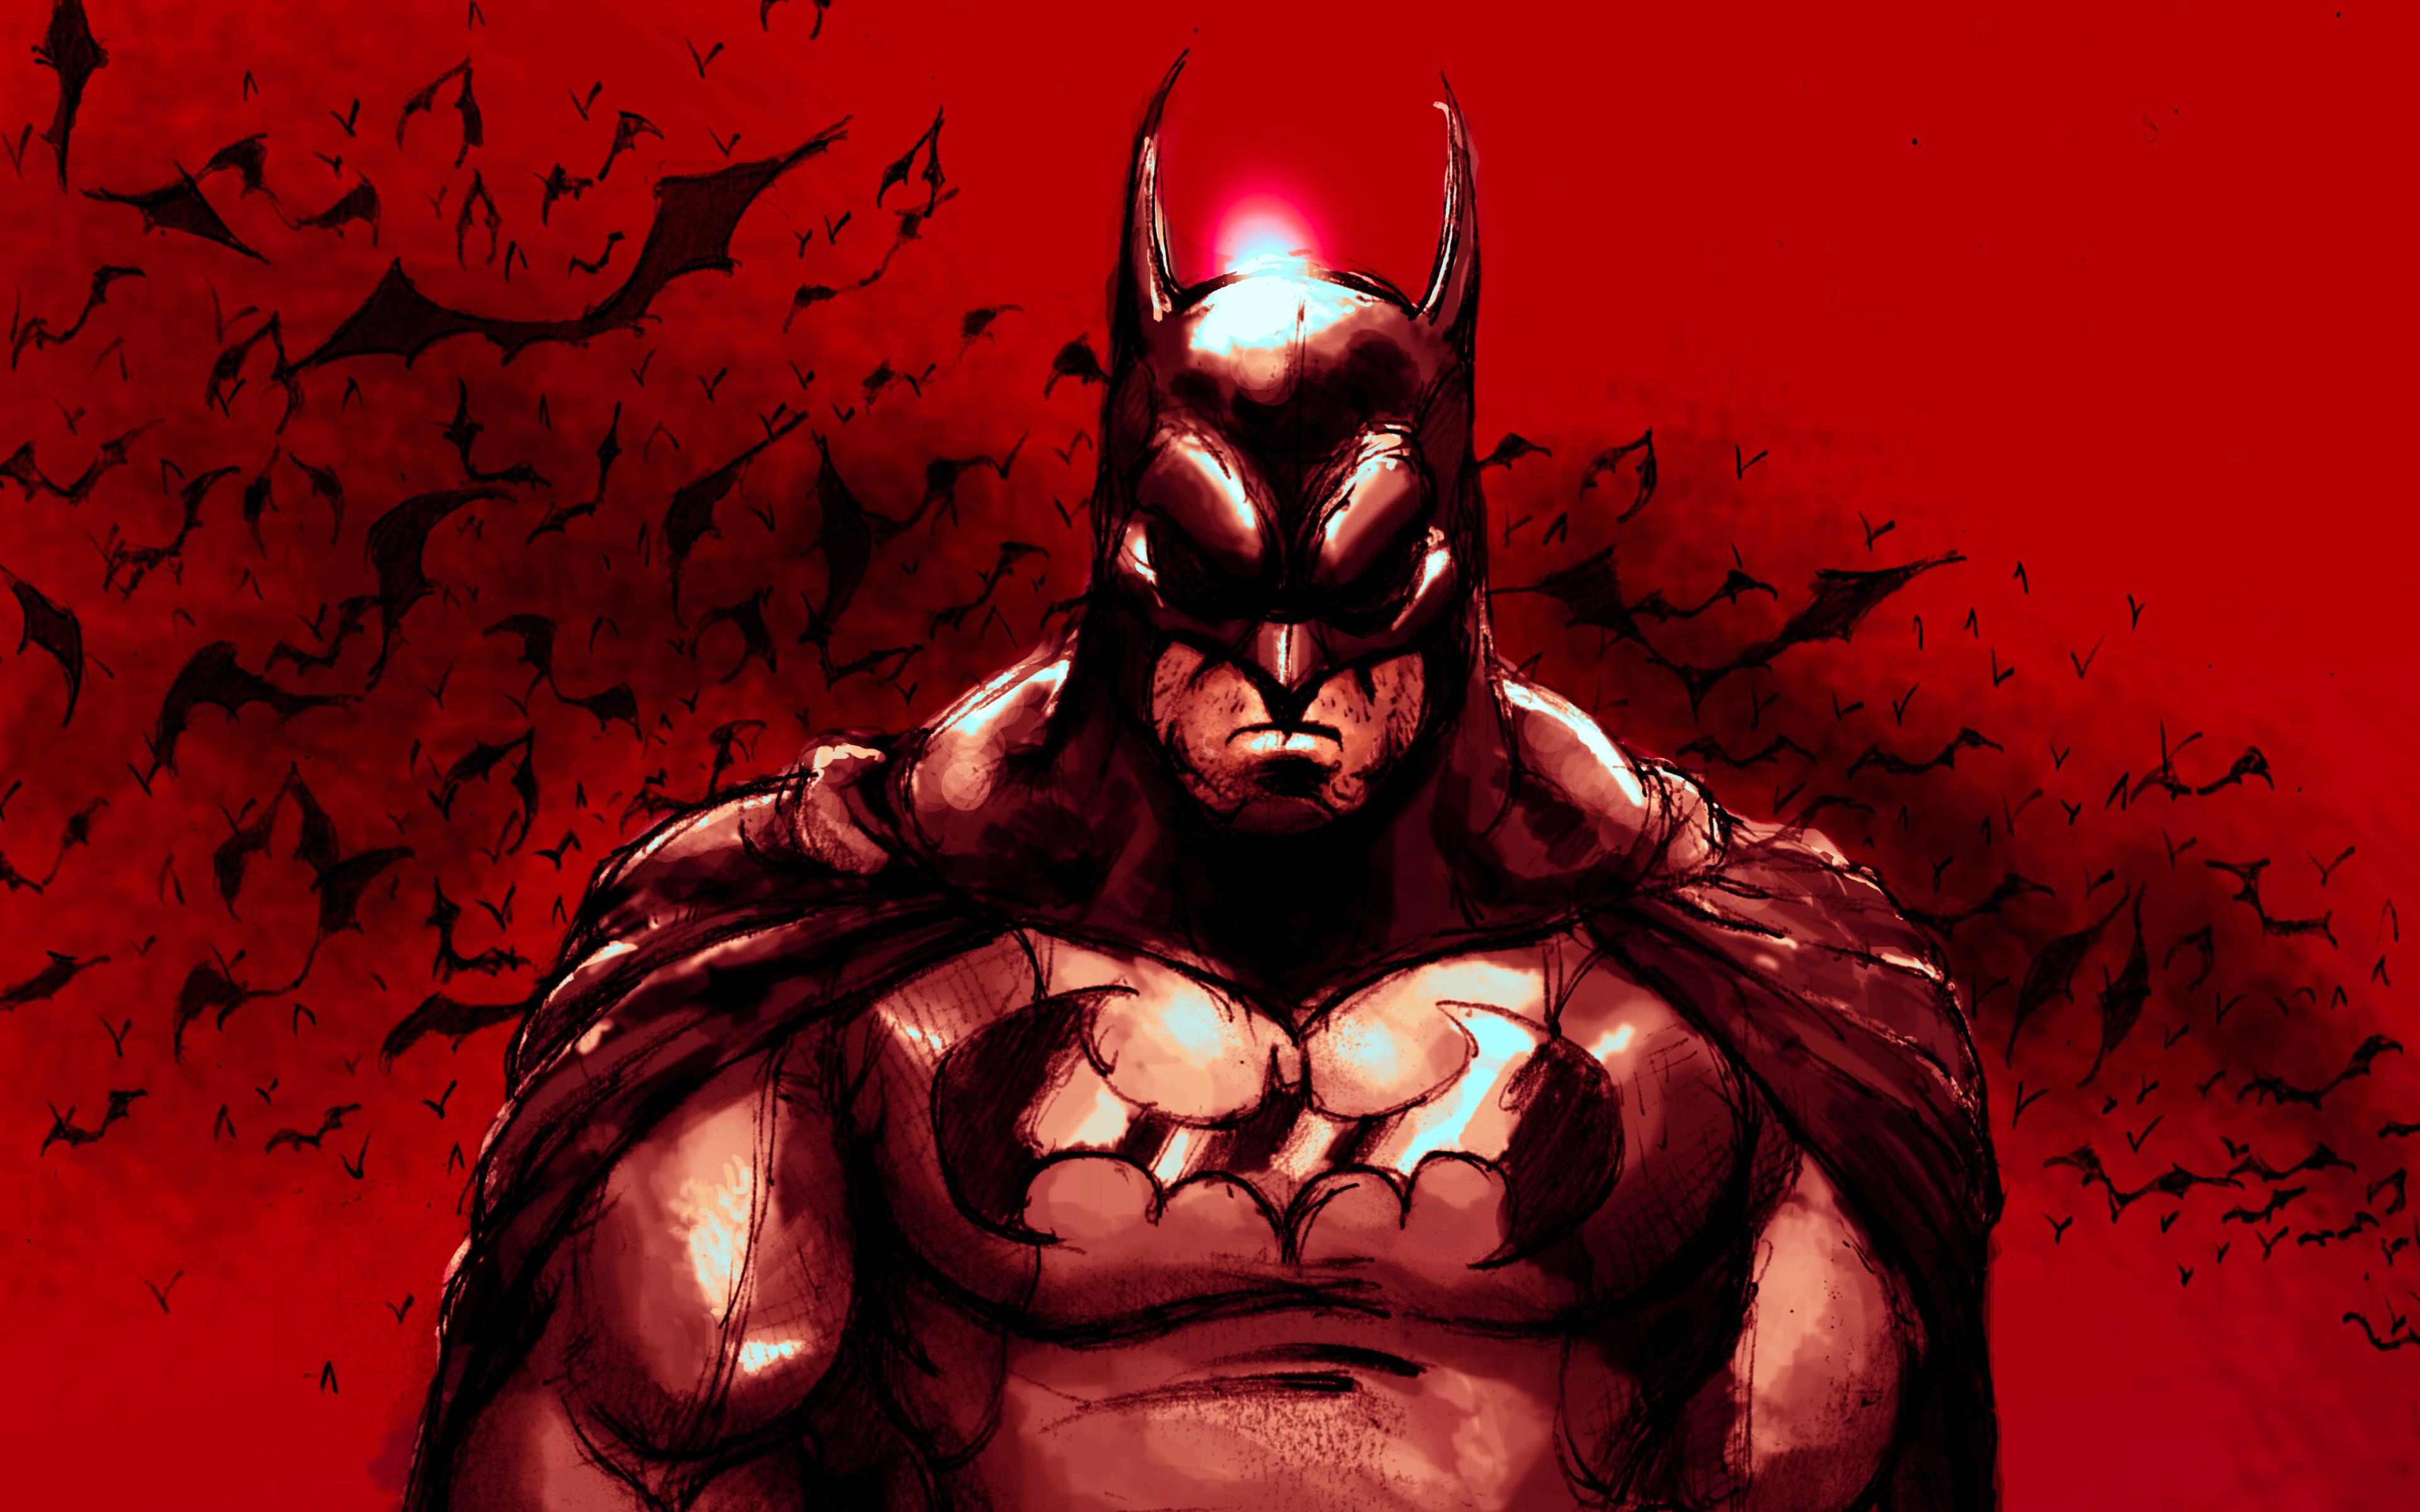 Red Batman Wallpaper 4k